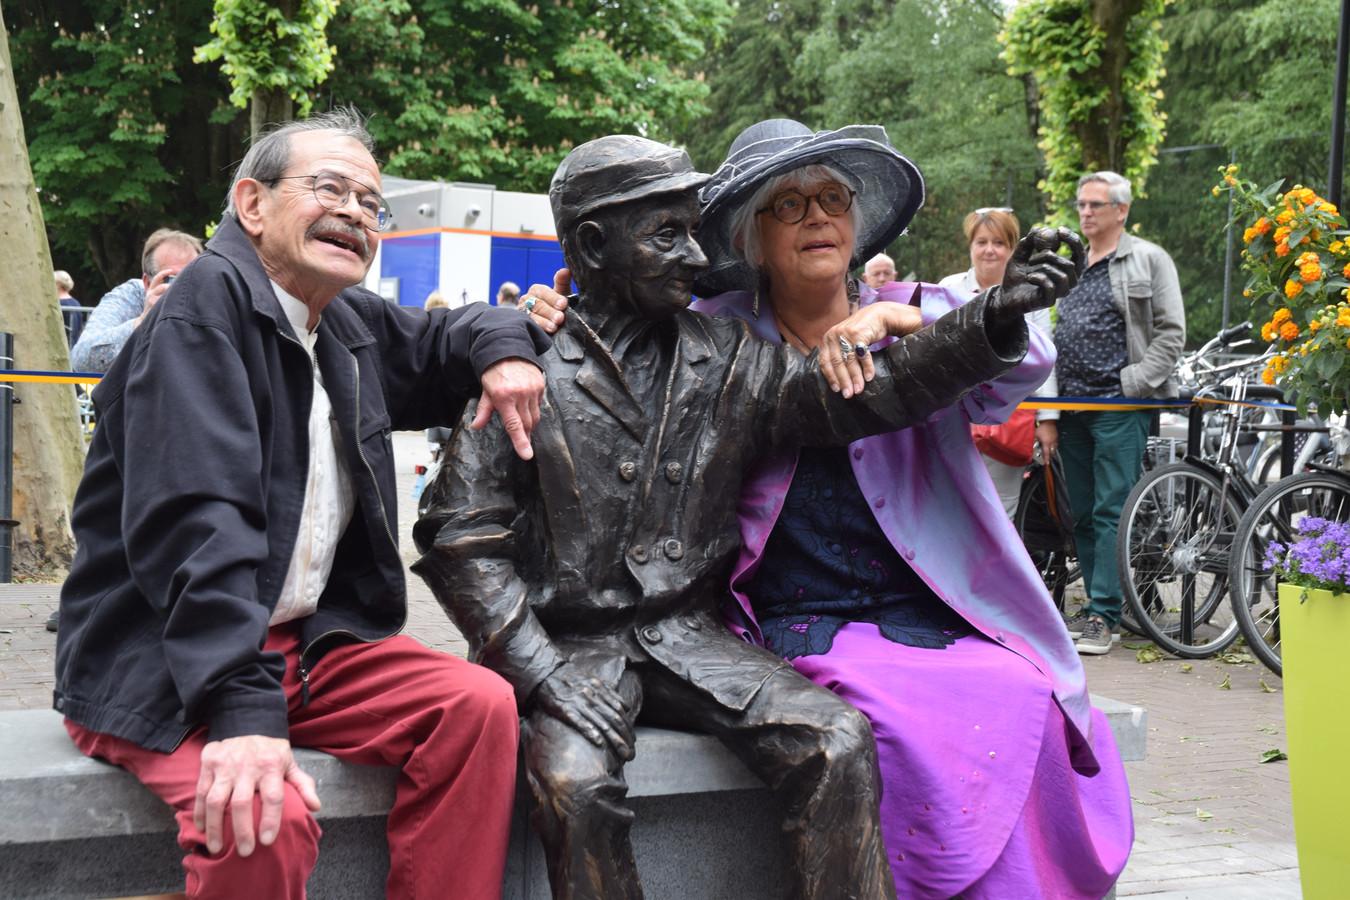 Kunstenares Jeanne van Midde en haar man Peter omarmen D'n Ballefrutter.